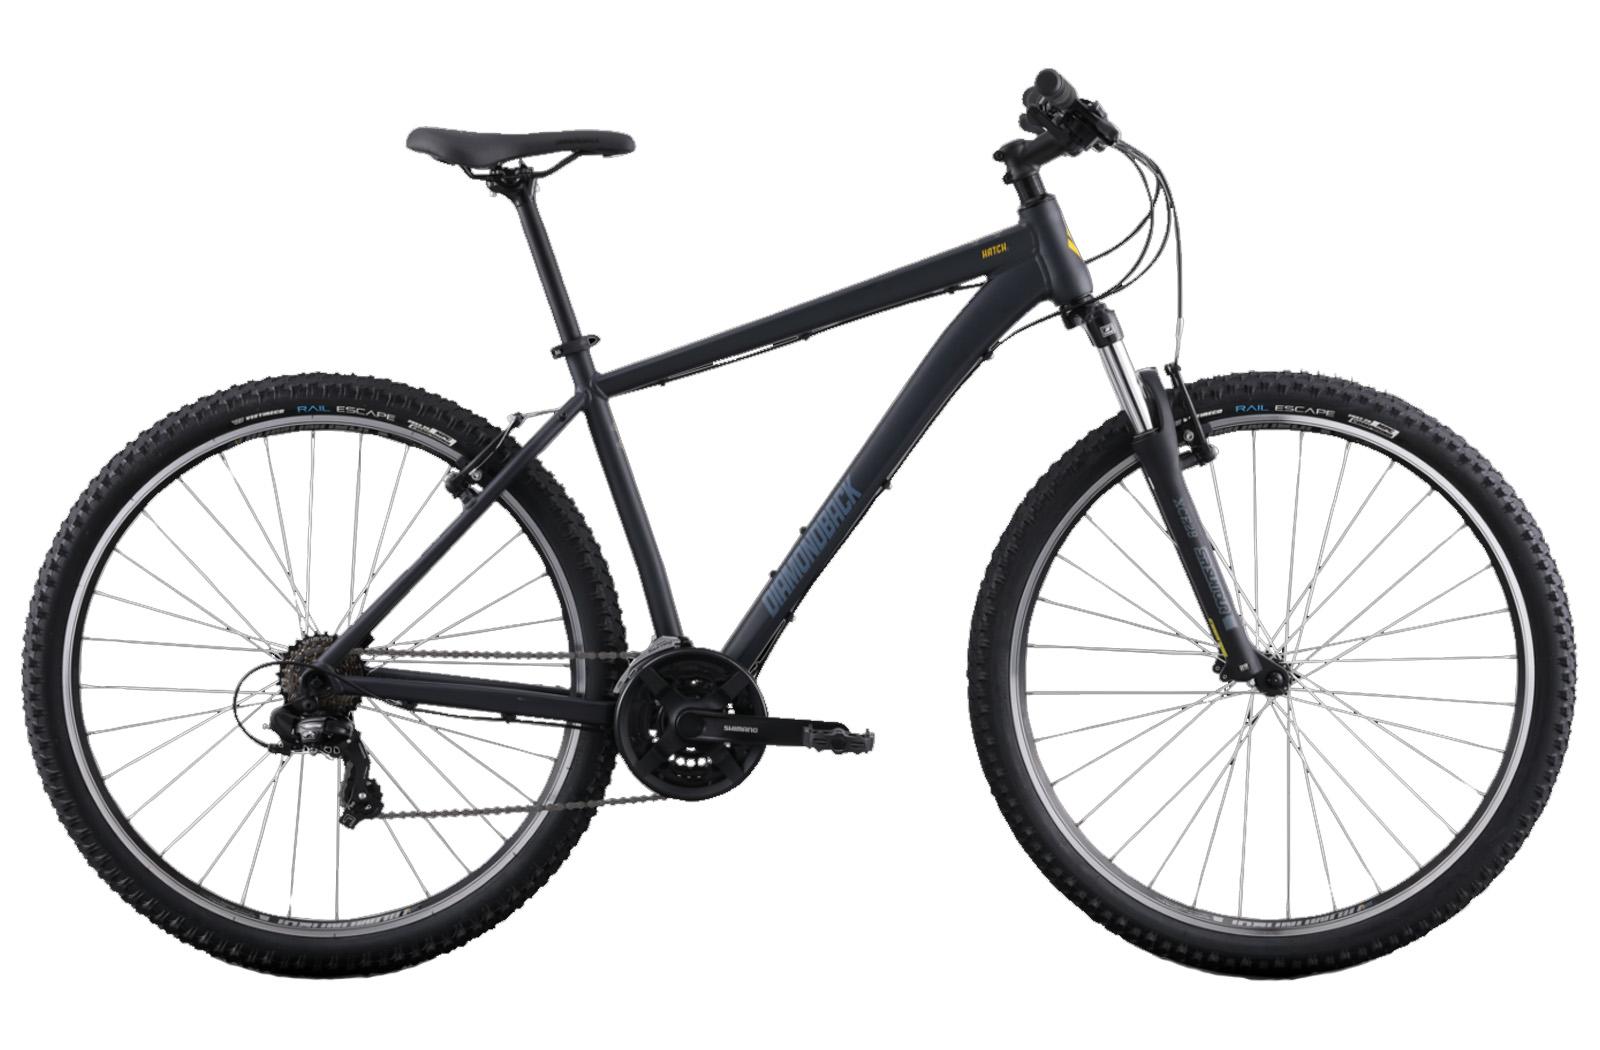 Available Now: Diamondback Hatch 1 Mountain Bike & SILCA HX-One Toolkit